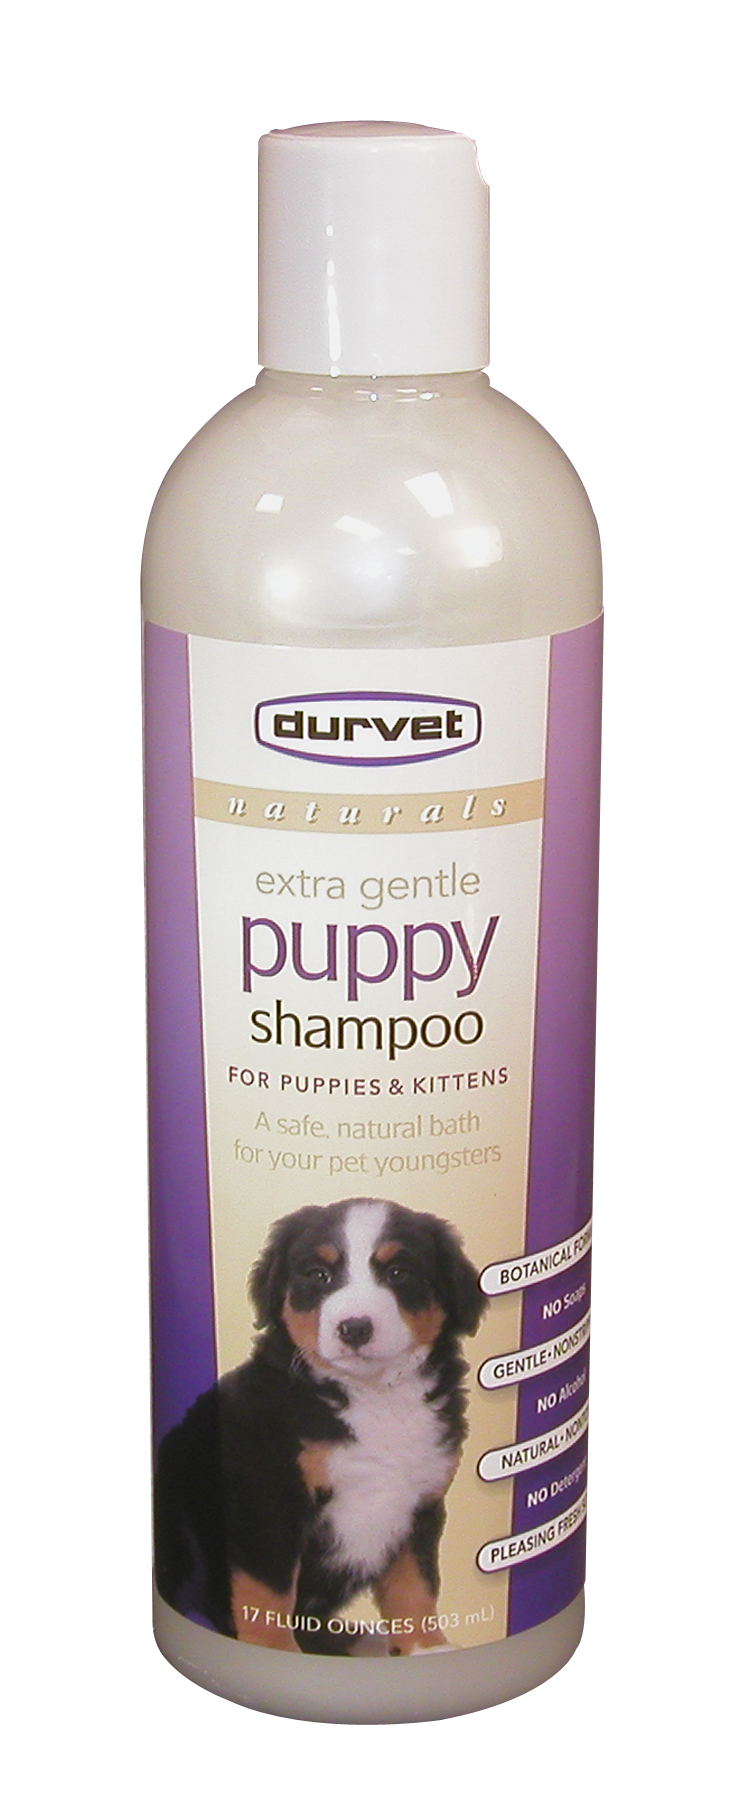 Durvet 011-51100 Naturals Puppy Shampoo - 17oz